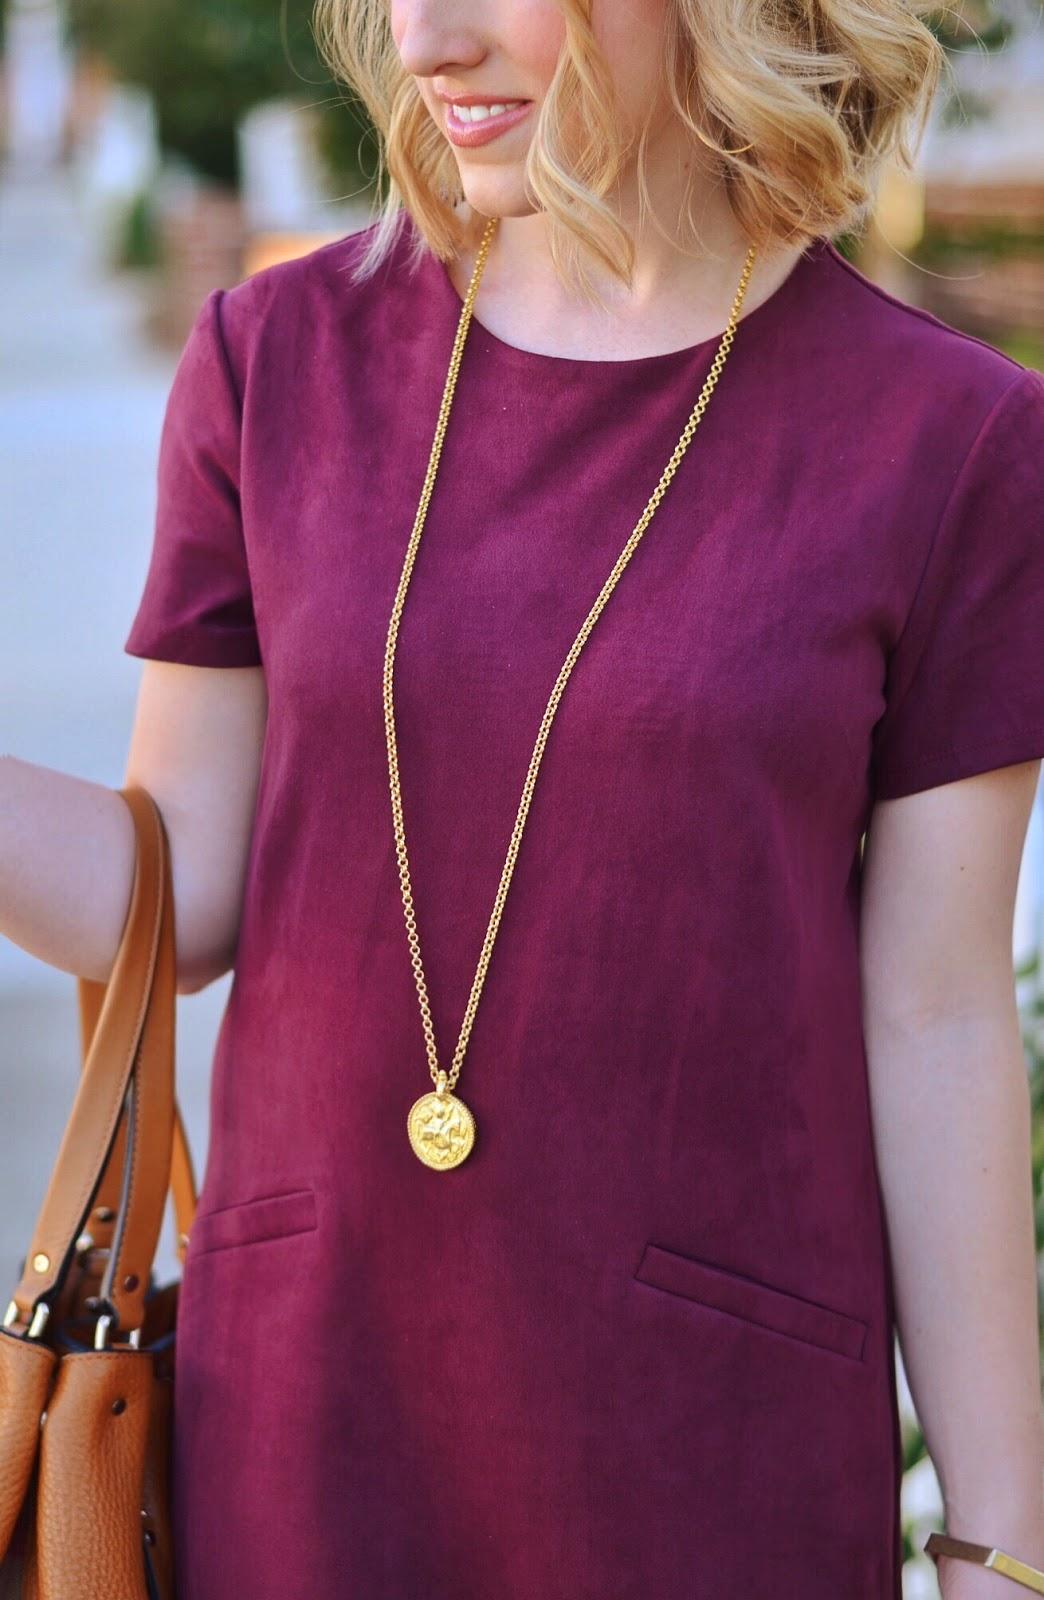 Julie Vos Coin Necklace